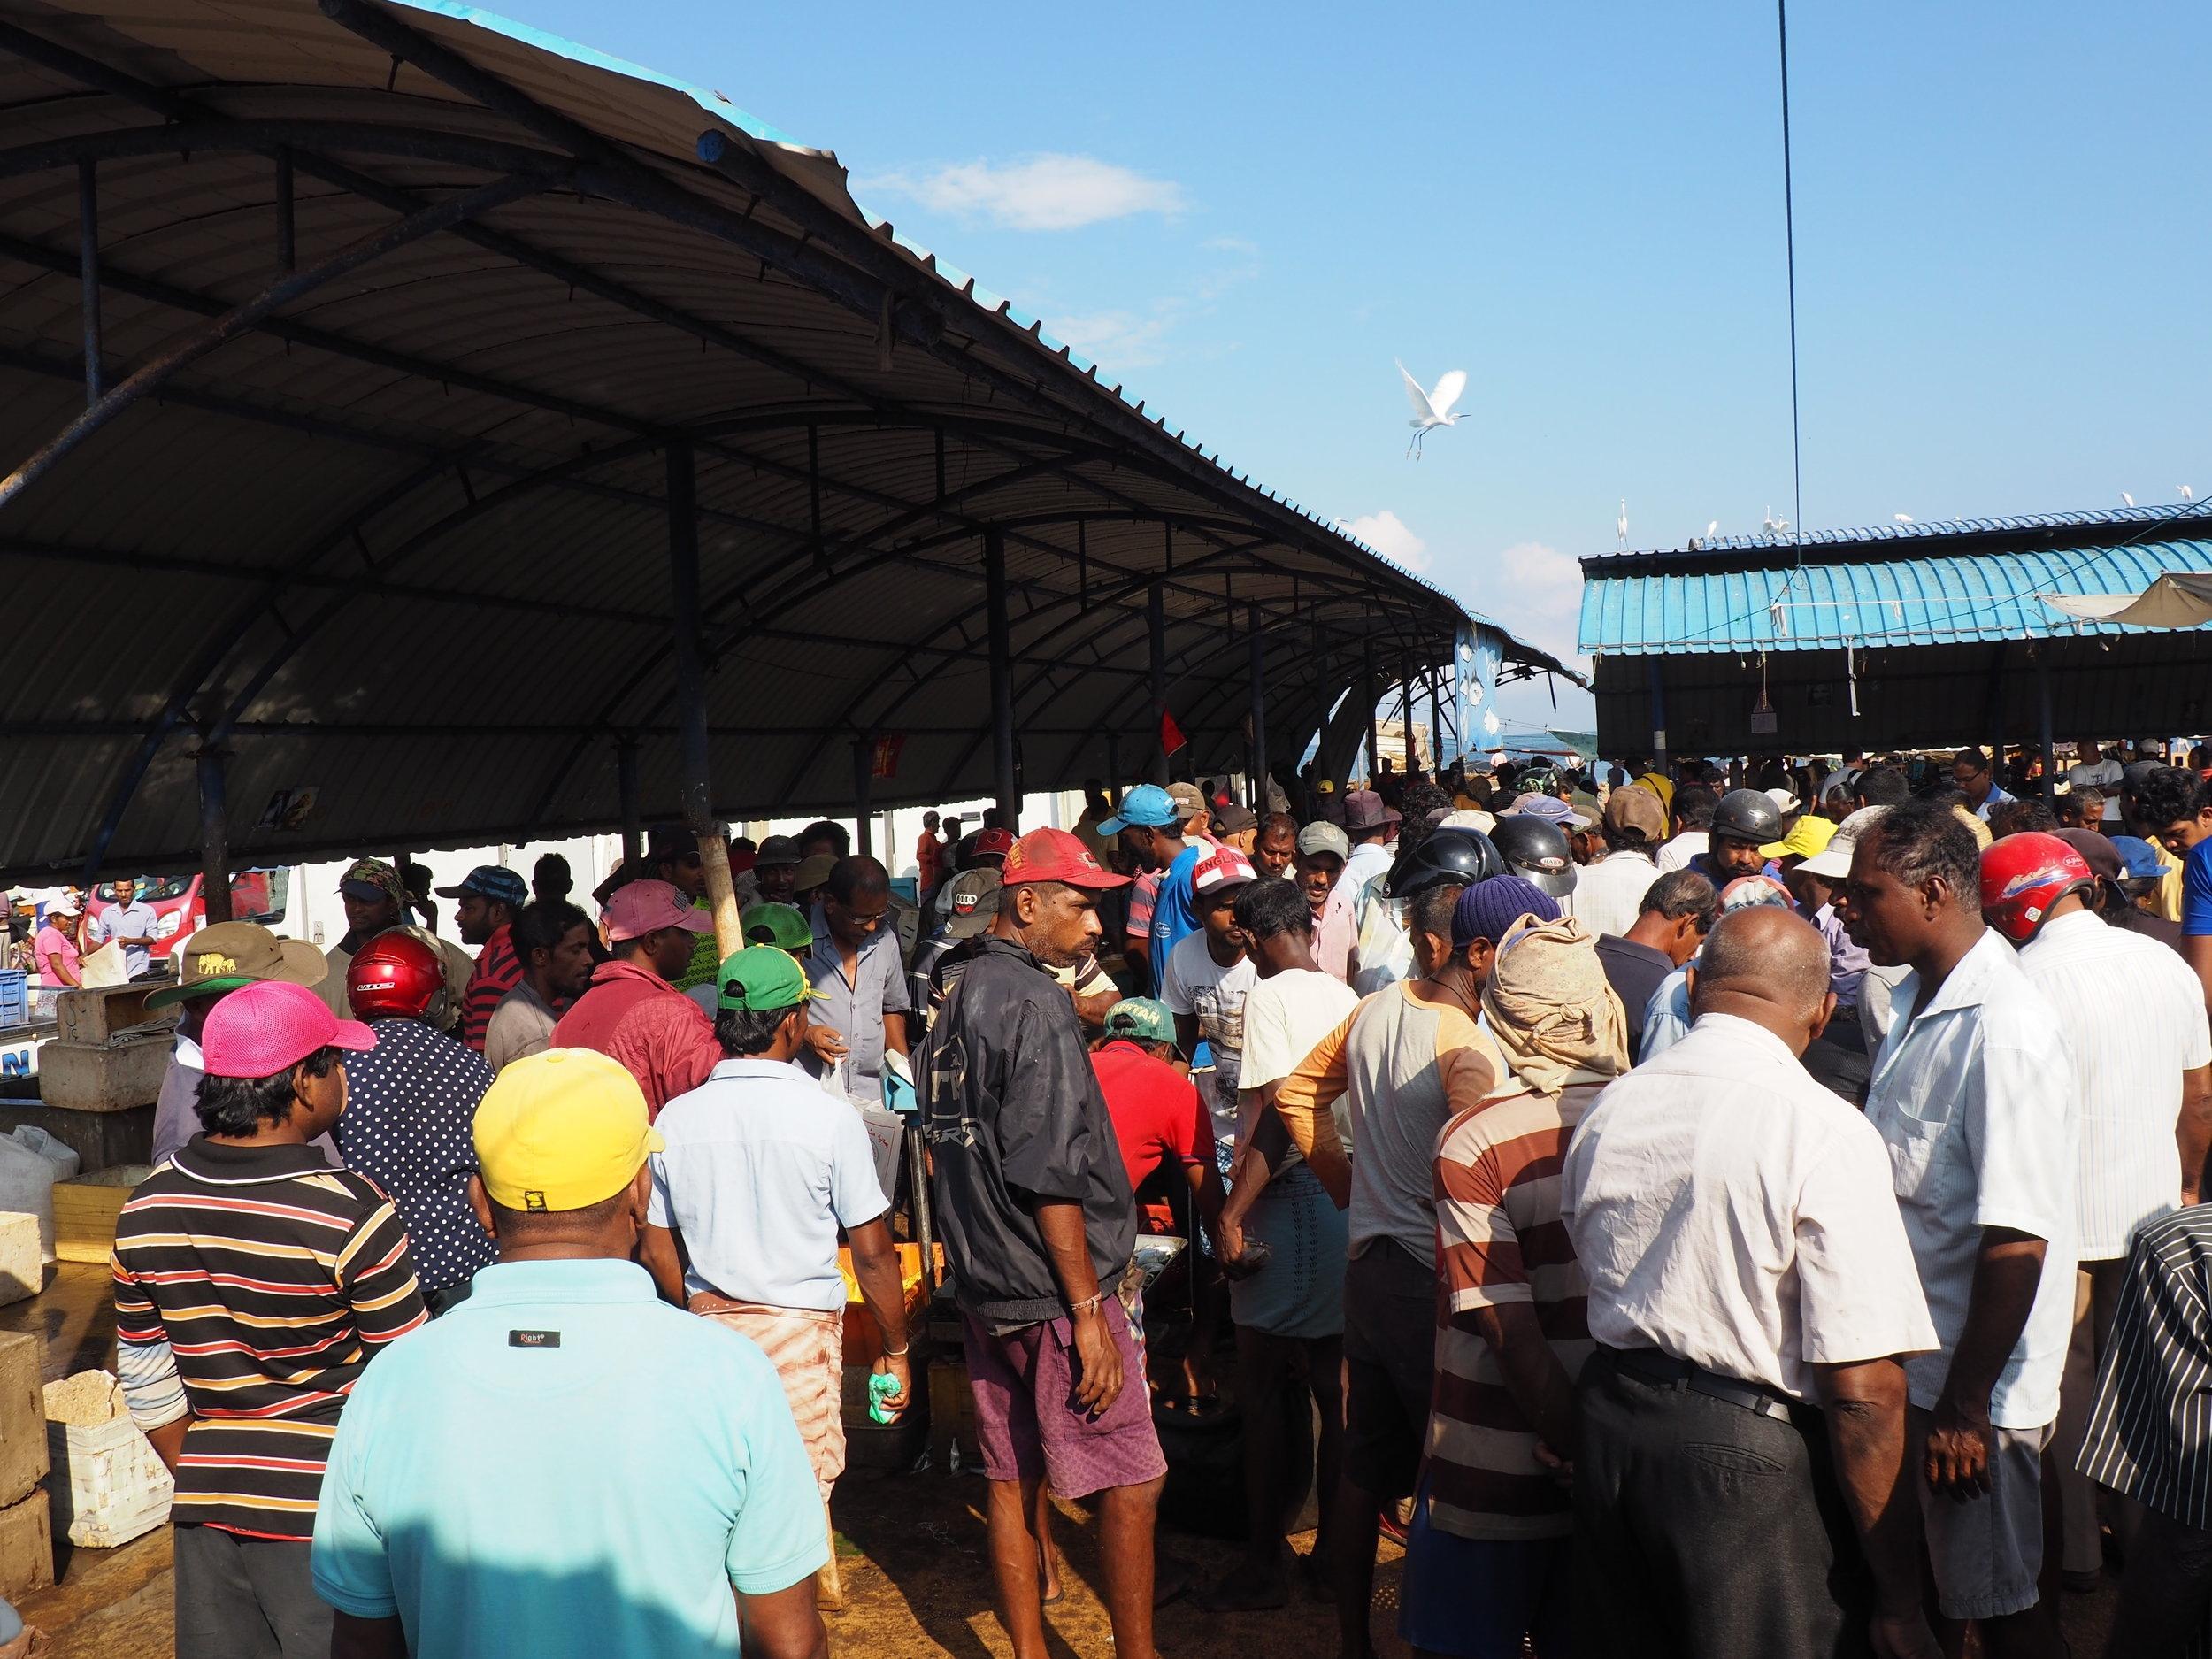 Negombo fish market crowd.JPG